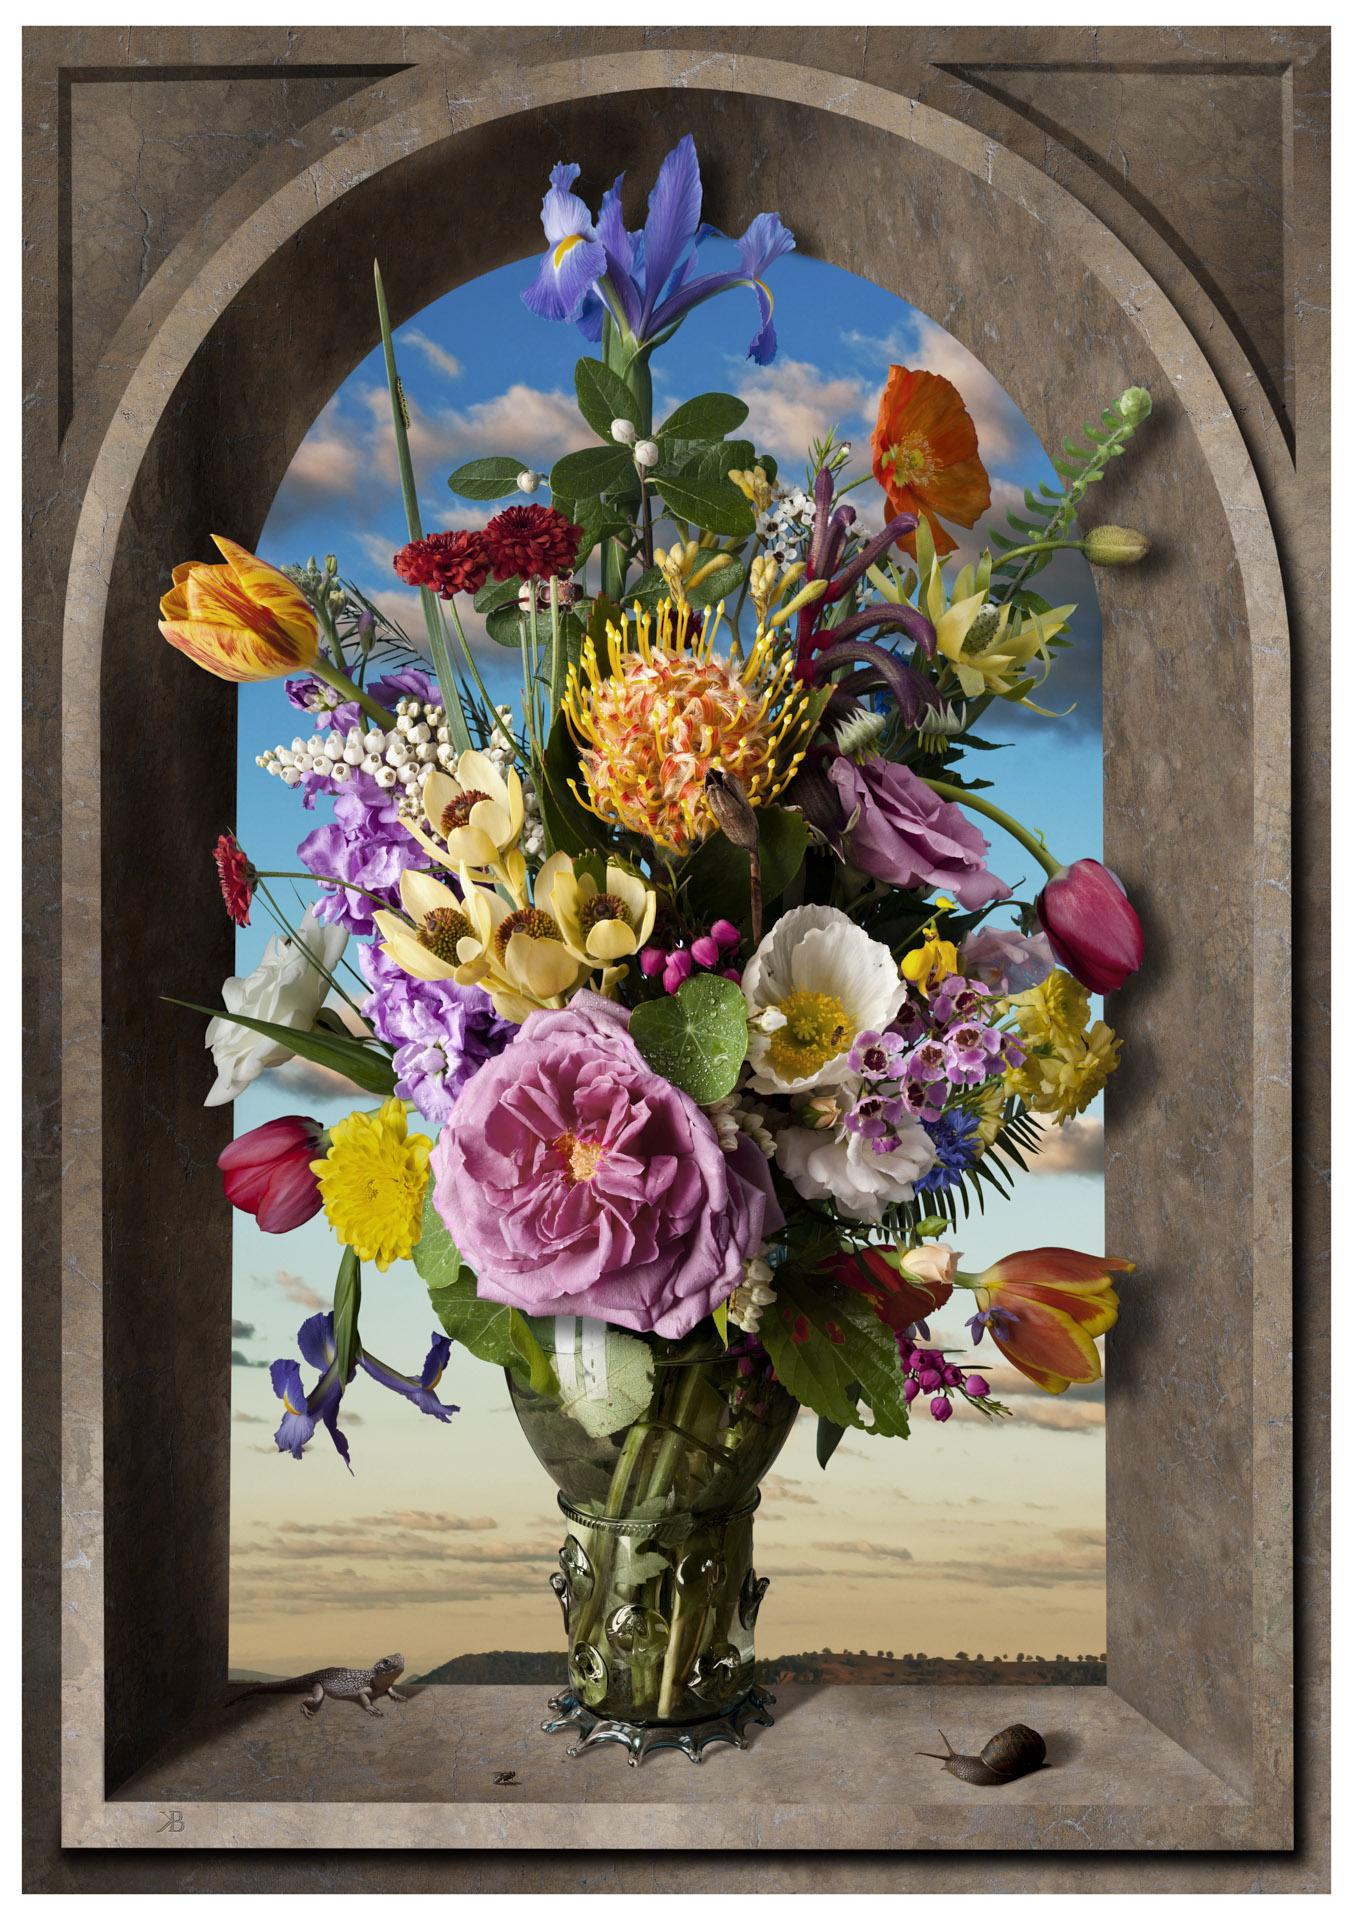 Still life with flowers after Ambrosius Bosschaert